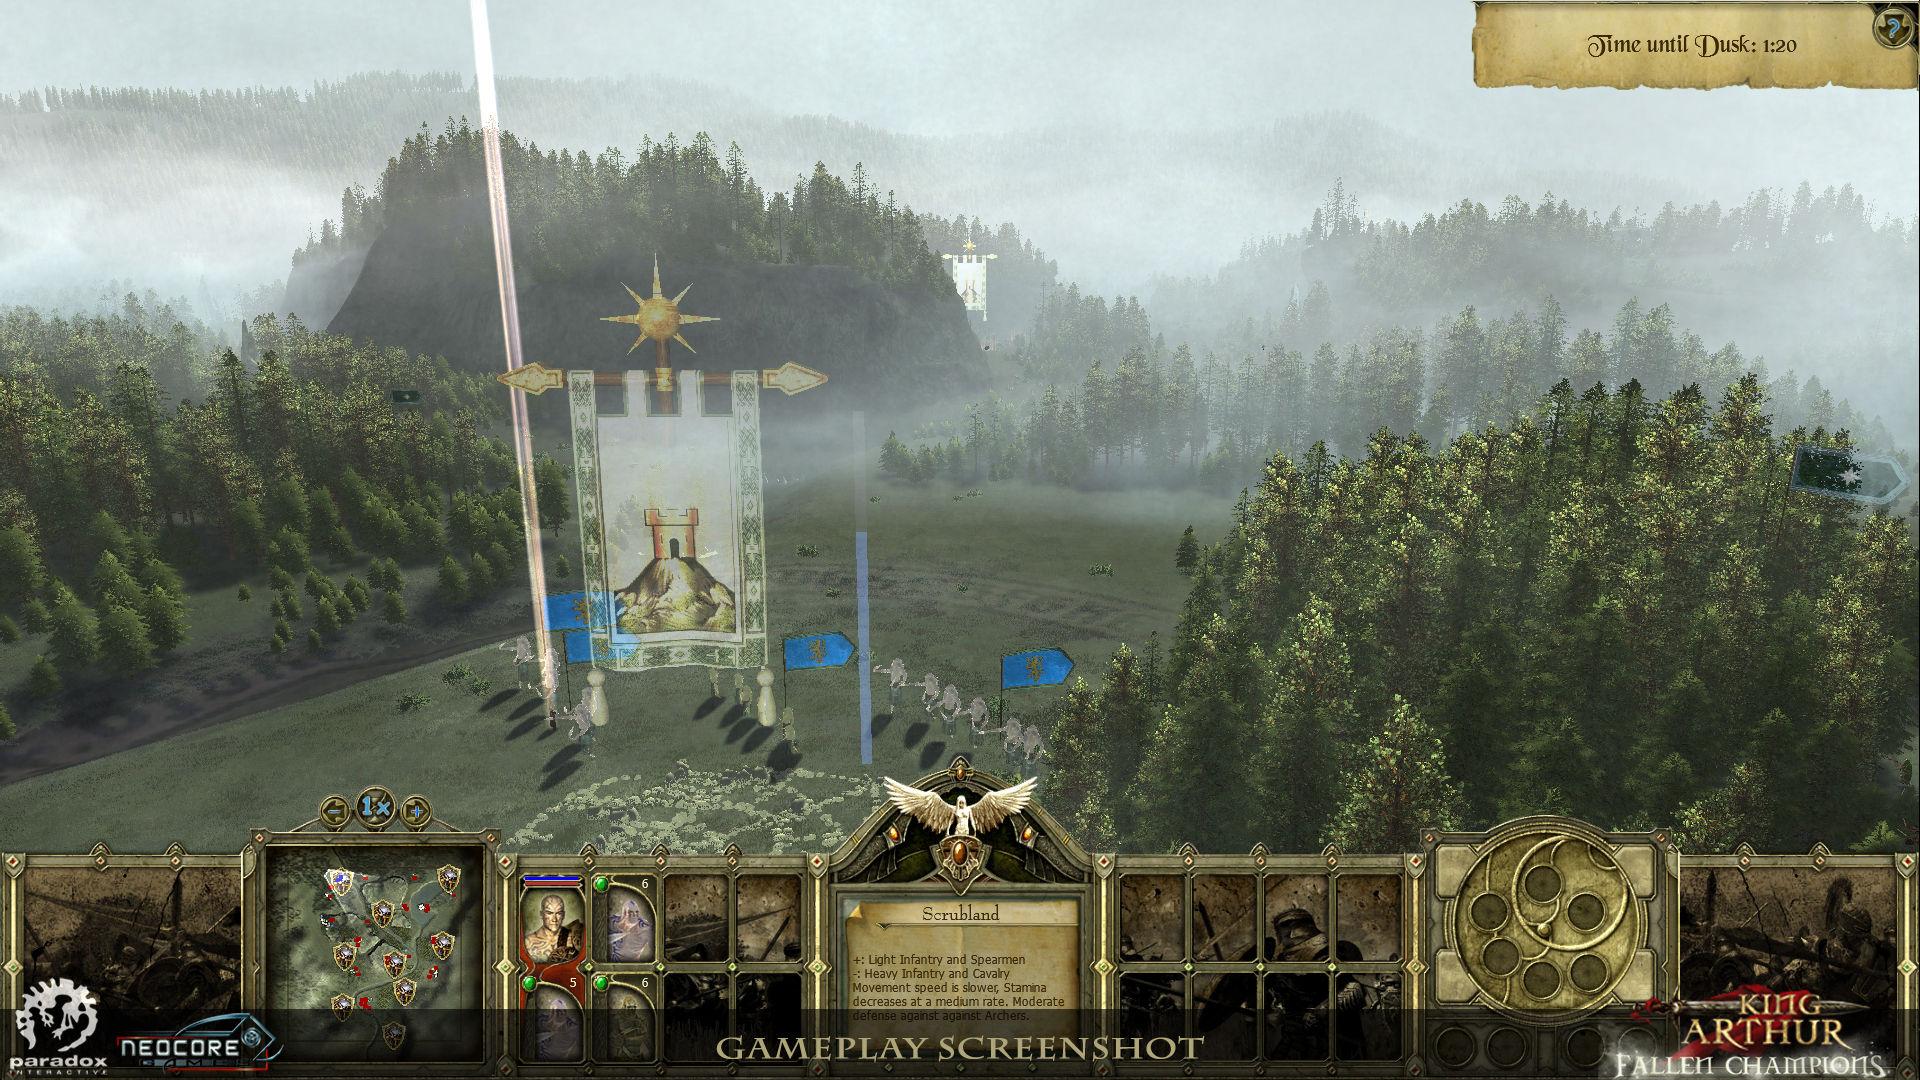 Představena strategie King Arthur: Fallen Champions 45431